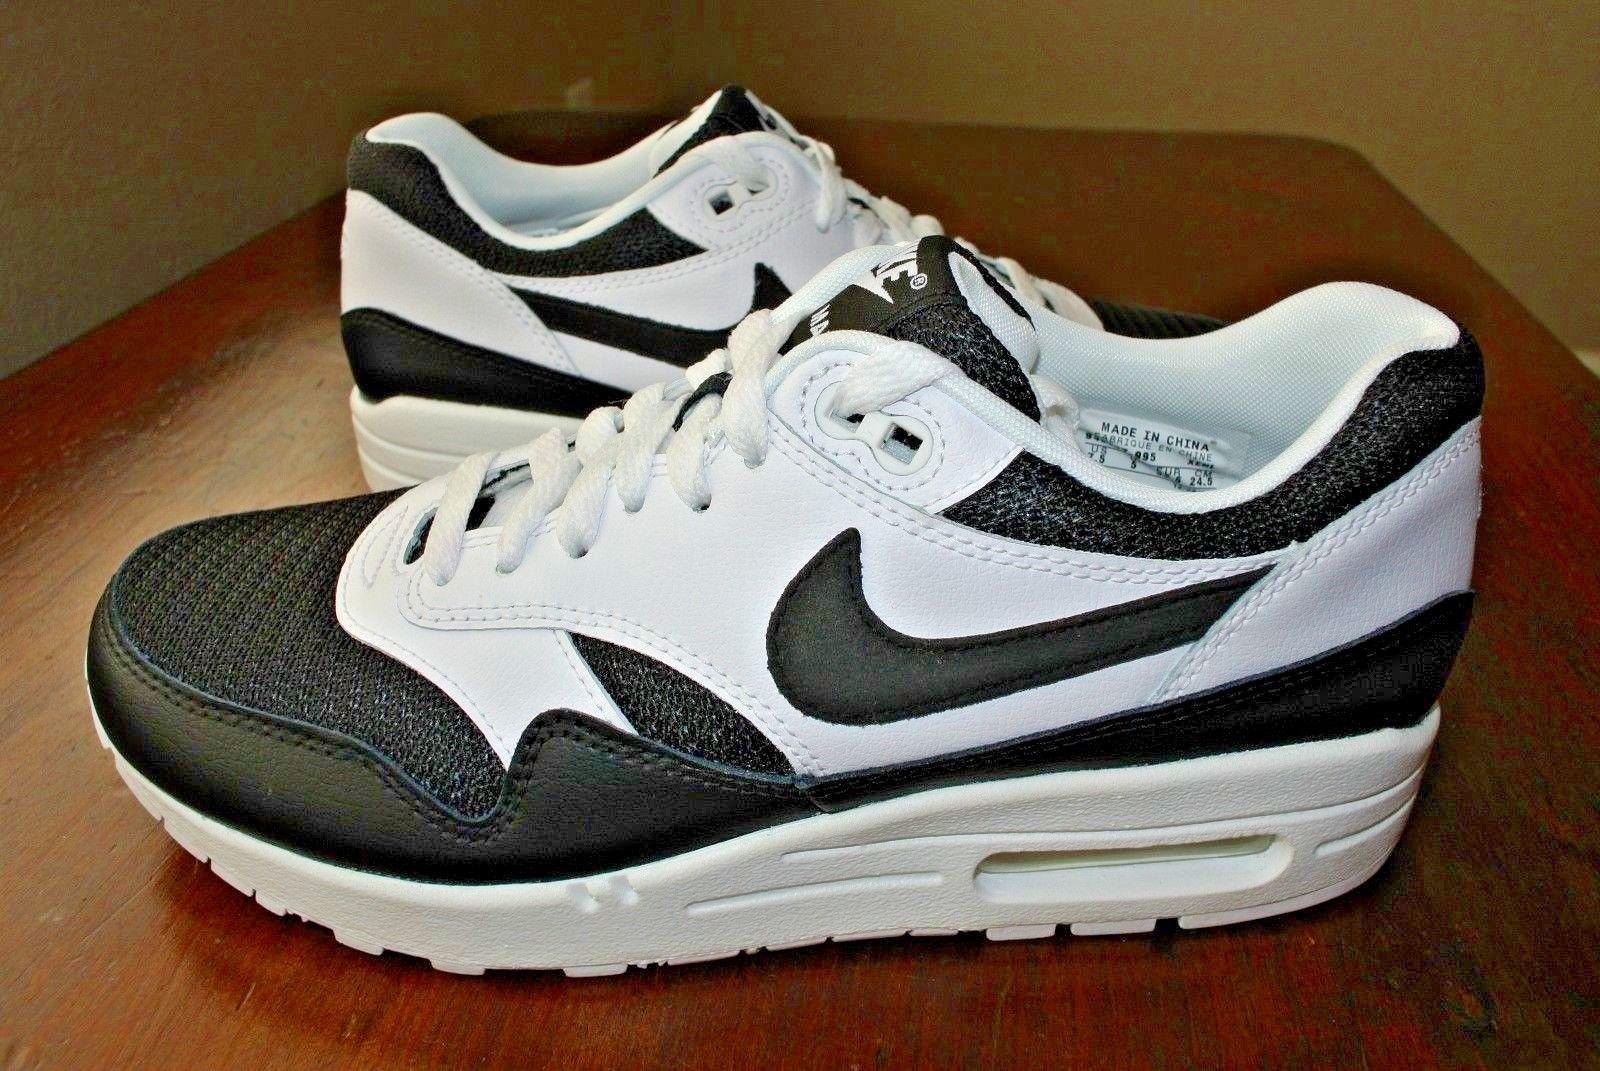 huge sale 5e834 ddbfa Nike Nikei D Air Max 1 Panda Black White and 50 similar items. 57